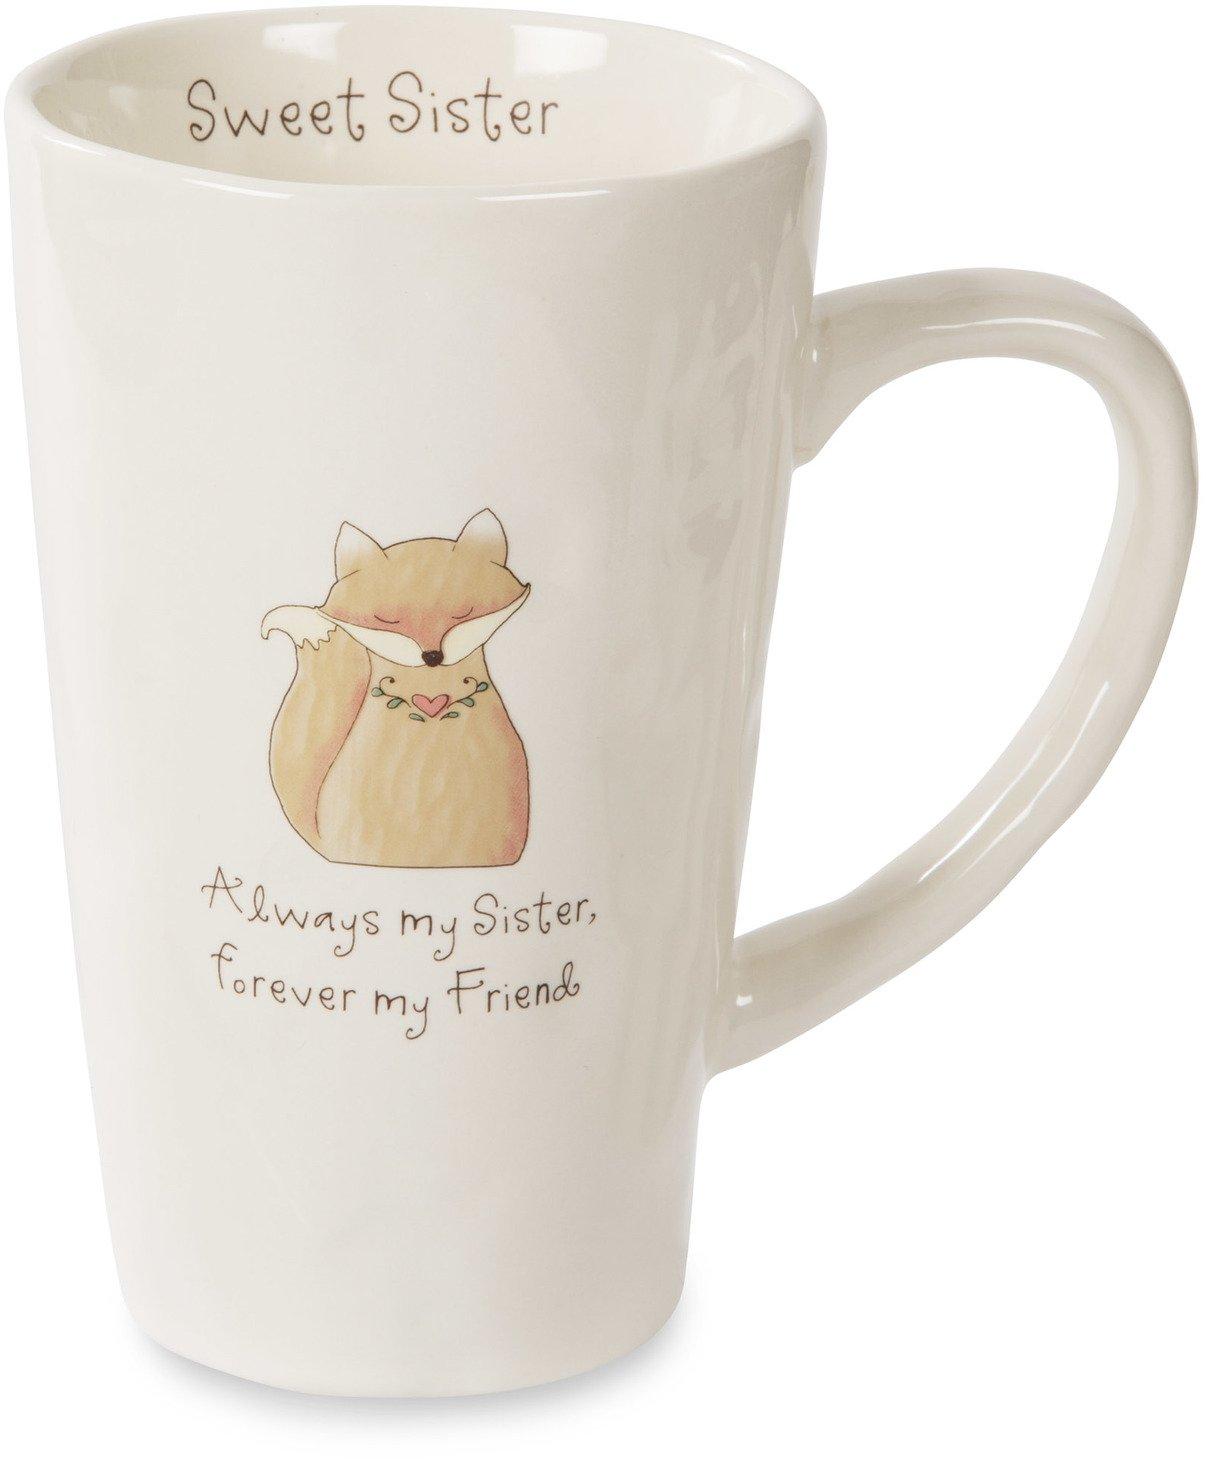 Pavilion Gift Company Heavenly Woods Fox Sweet Sister Ceramic Mug, 18 oz, Off-White